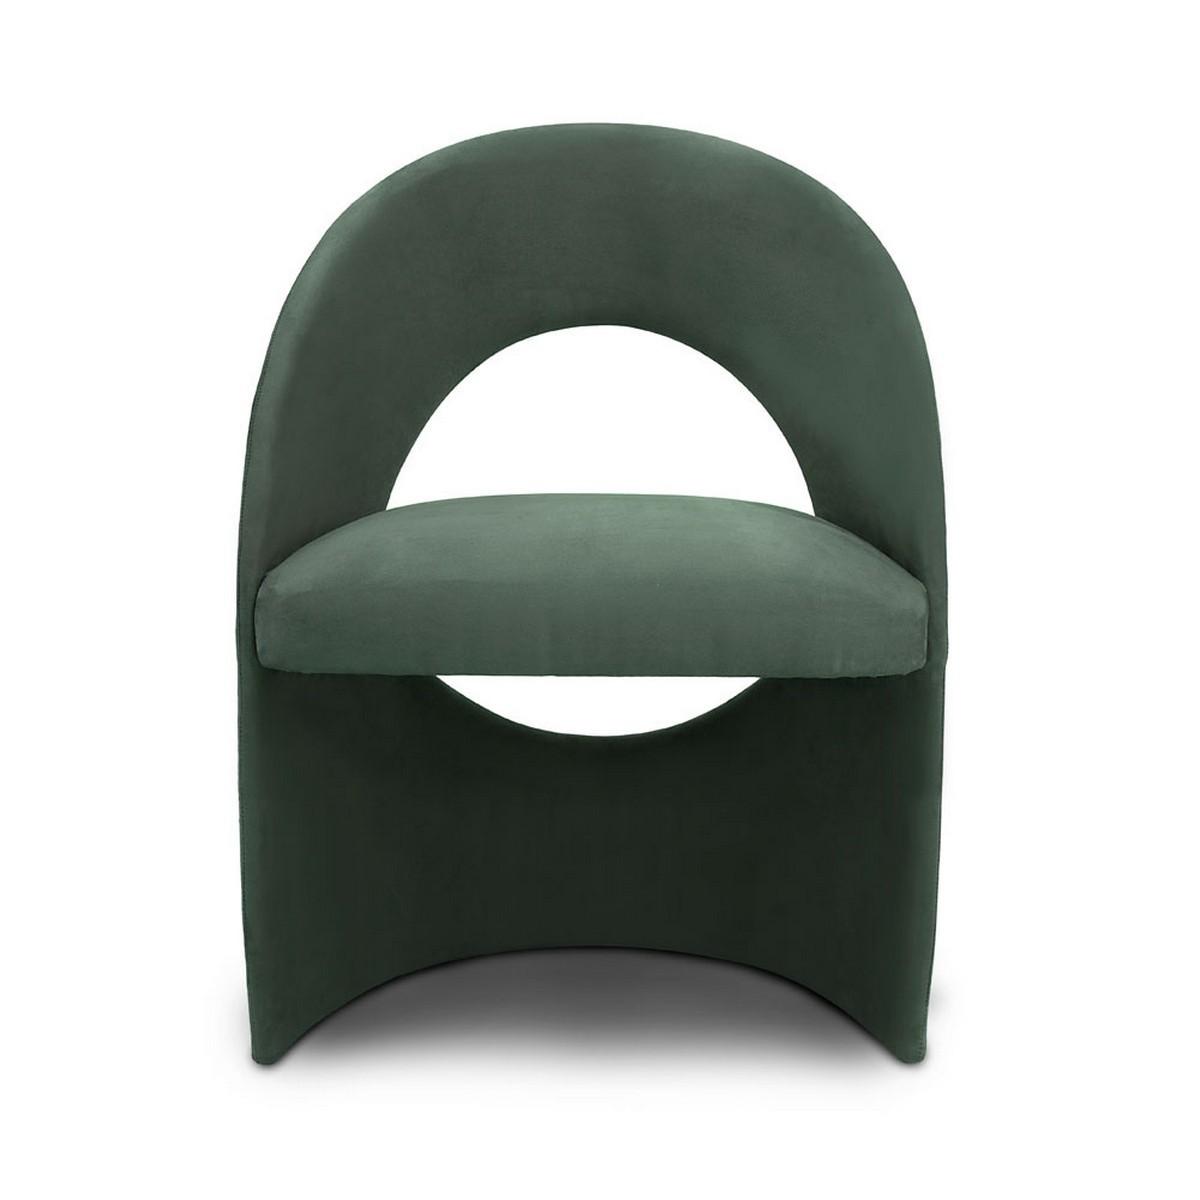 minimalist dining chairs Top Minimalist Dining Chairs jones2